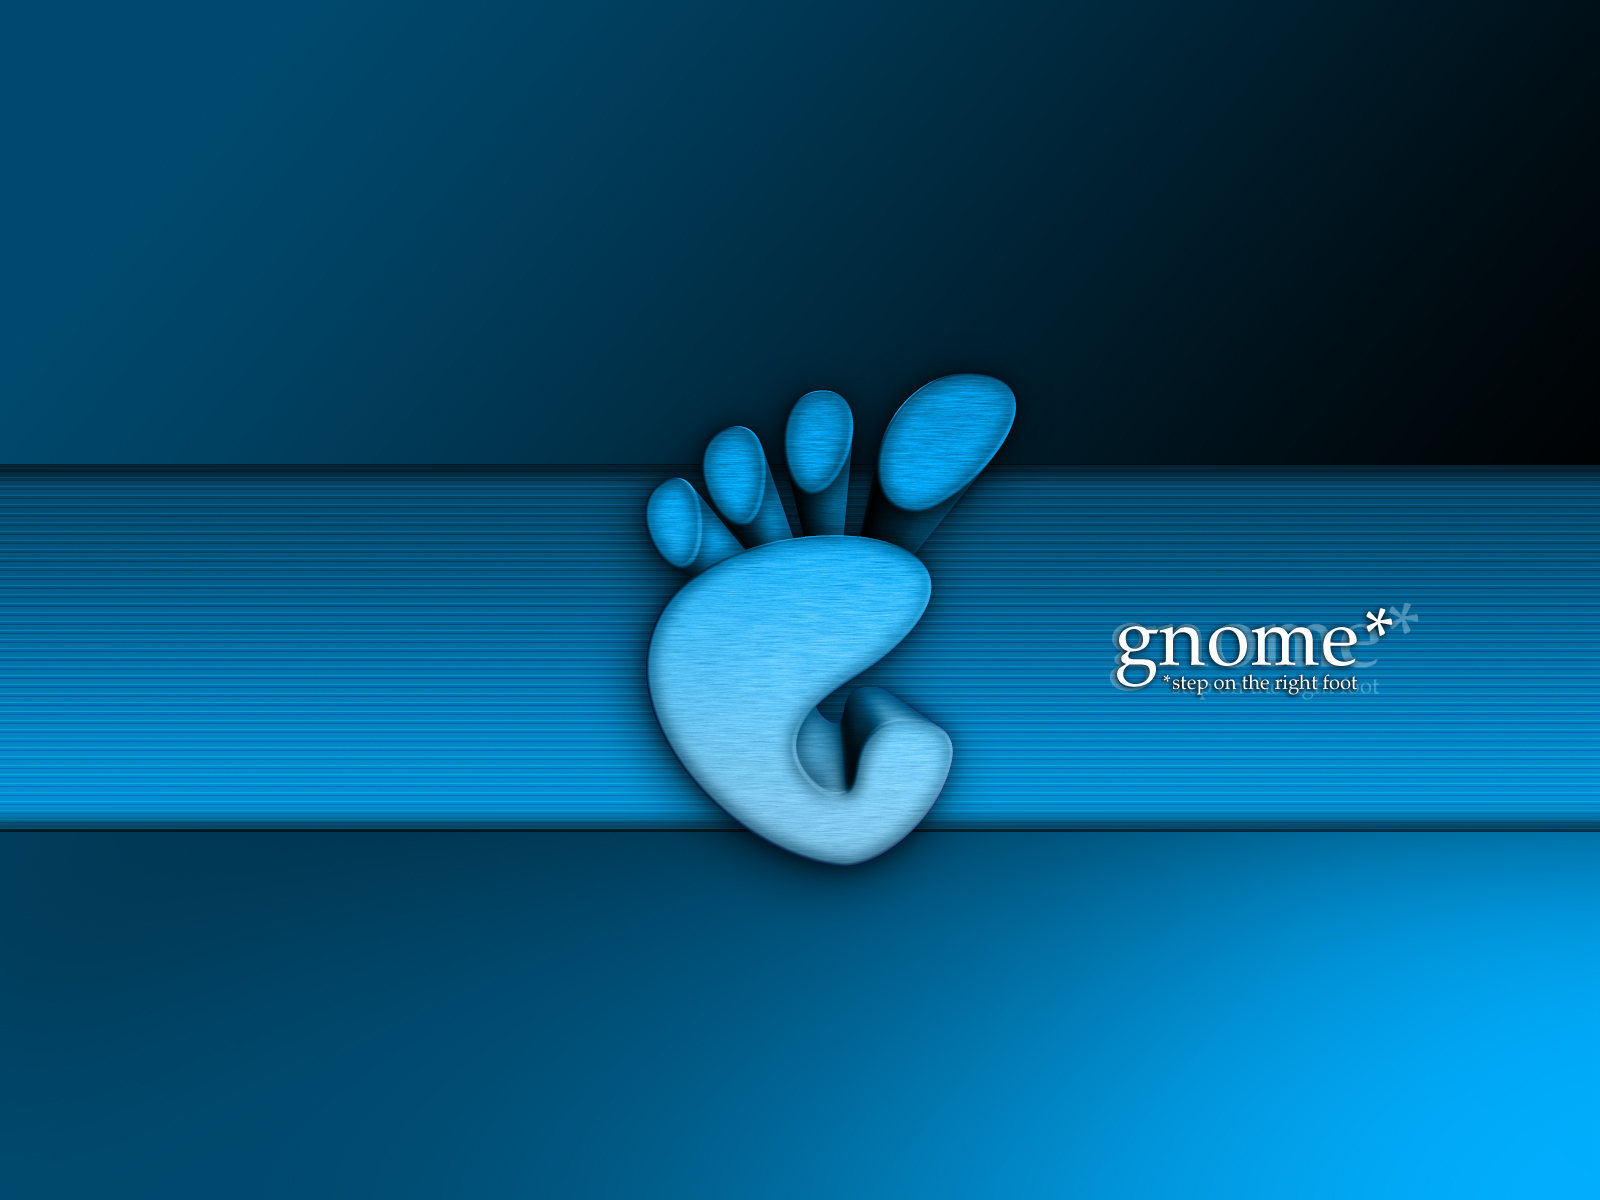 http://3.bp.blogspot.com/-r5r0duGqmG0/TpVQSg8MHWI/AAAAAAAAAIo/_x_rlveh0I4/s1600/Gnome+HD+Wallpapers+%25285%2529.jpg